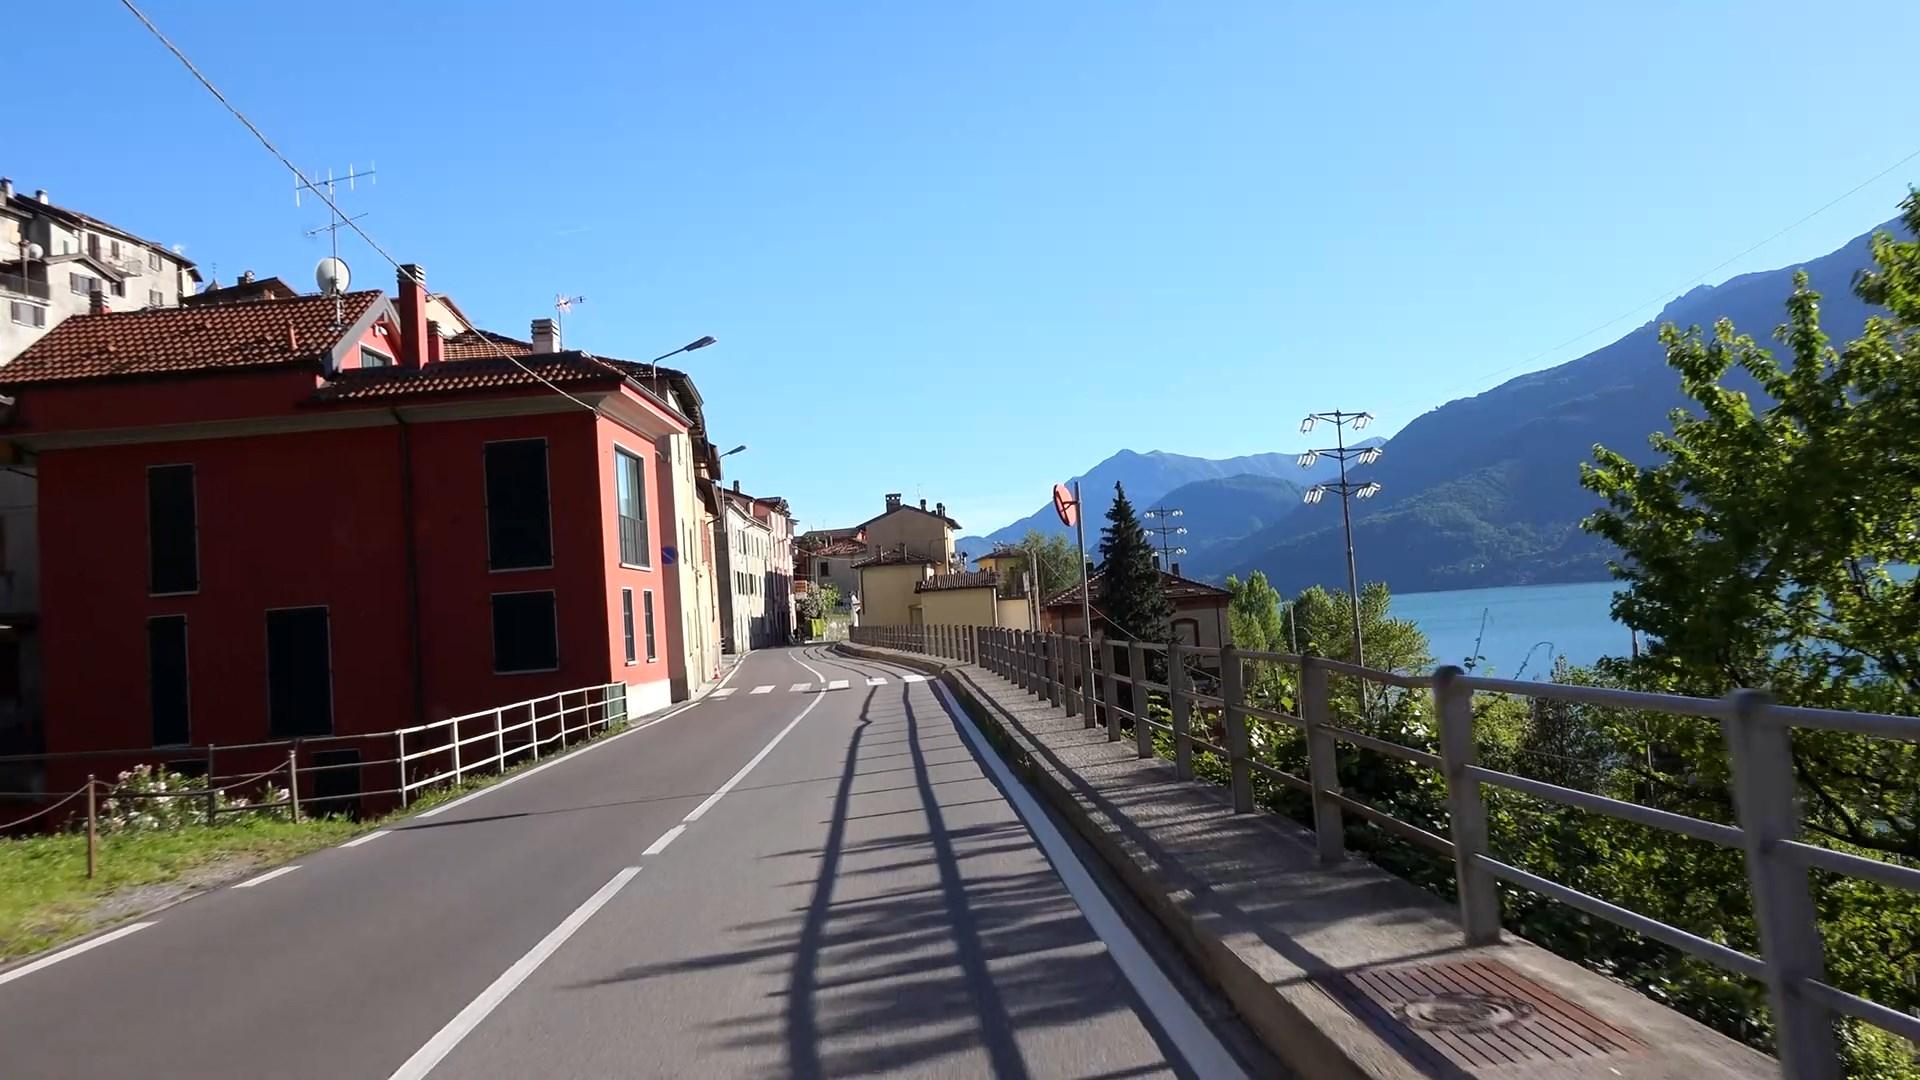 Part 4 of Lake Como Grand Tour. Gallery Image 4